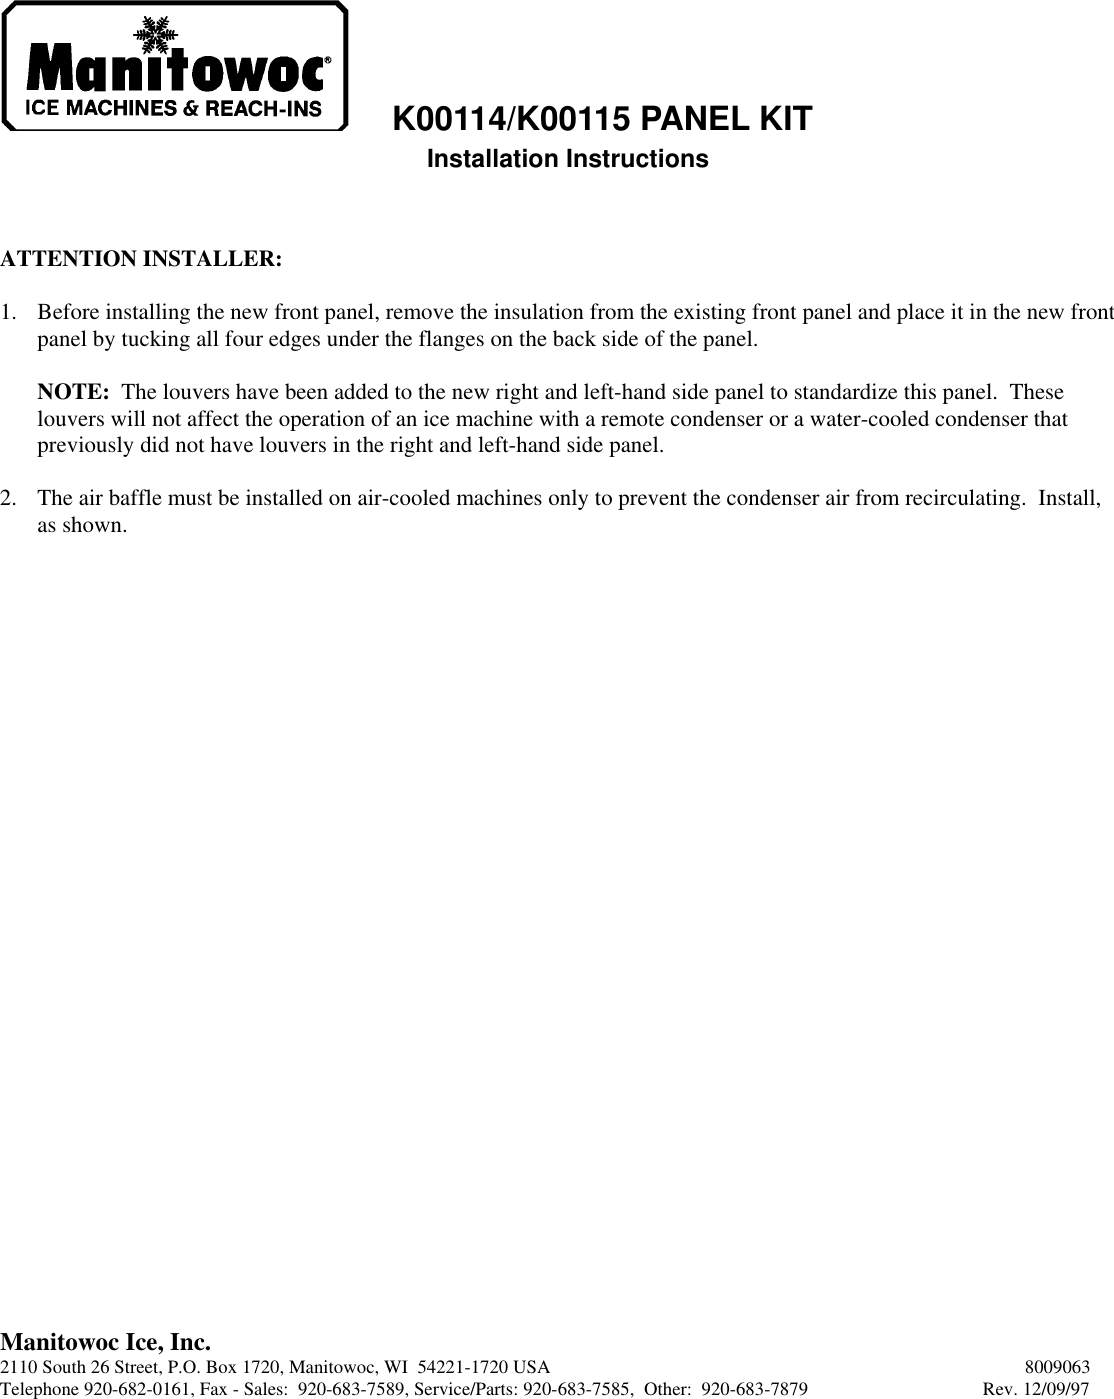 Manitowoc Ice K00114 Users Manual on